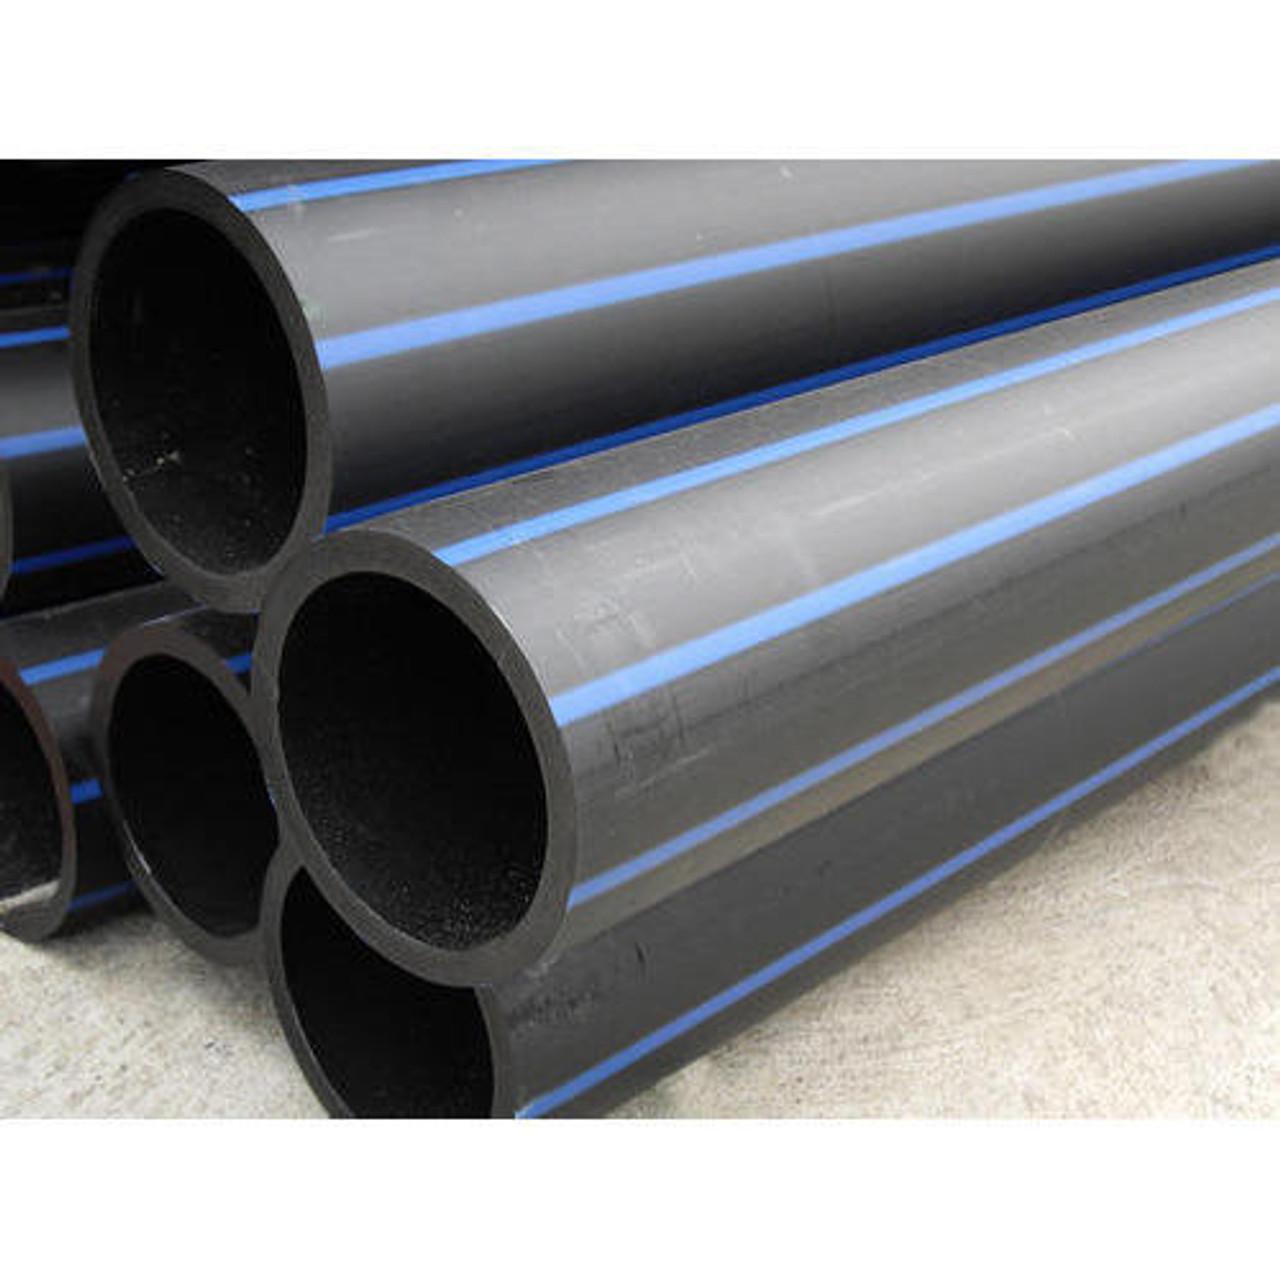 25mm PE100 PN12.5 Metric Polyethylene Pipe - Blue Stripe - 200m Coil